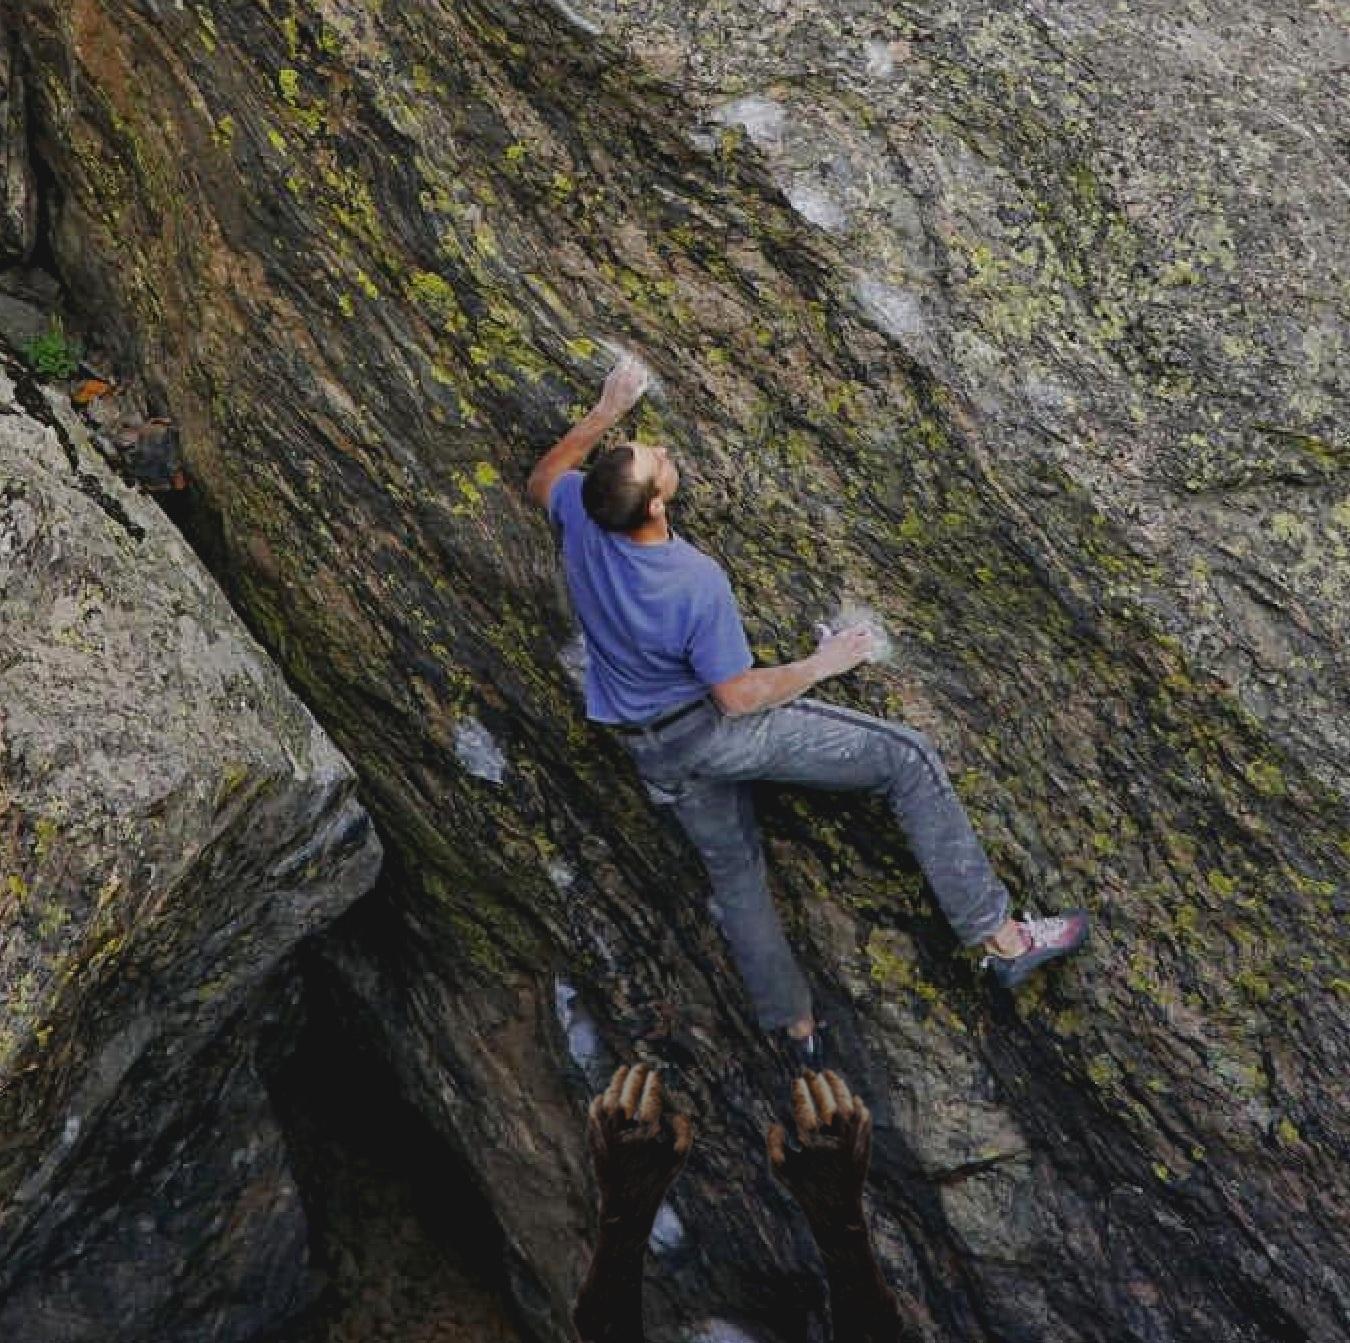 Avid climber, Nate Davison climbs through a crux with a Sasquatch as his trusty spotter.